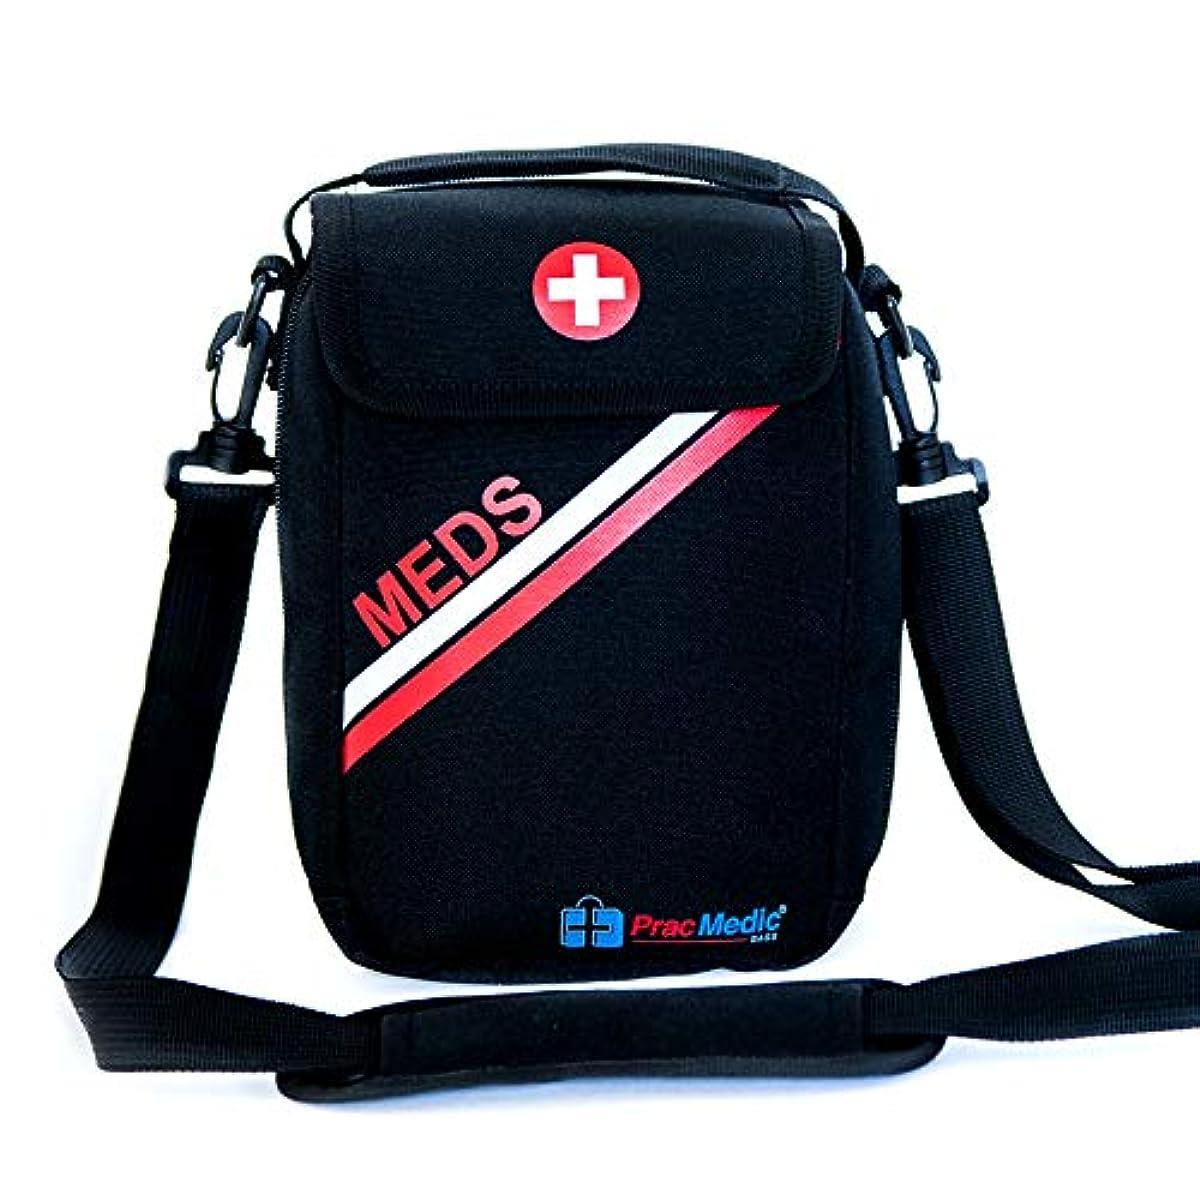 Pracmedic Bags 174 Lockable Insulated Travel Medicine Bag